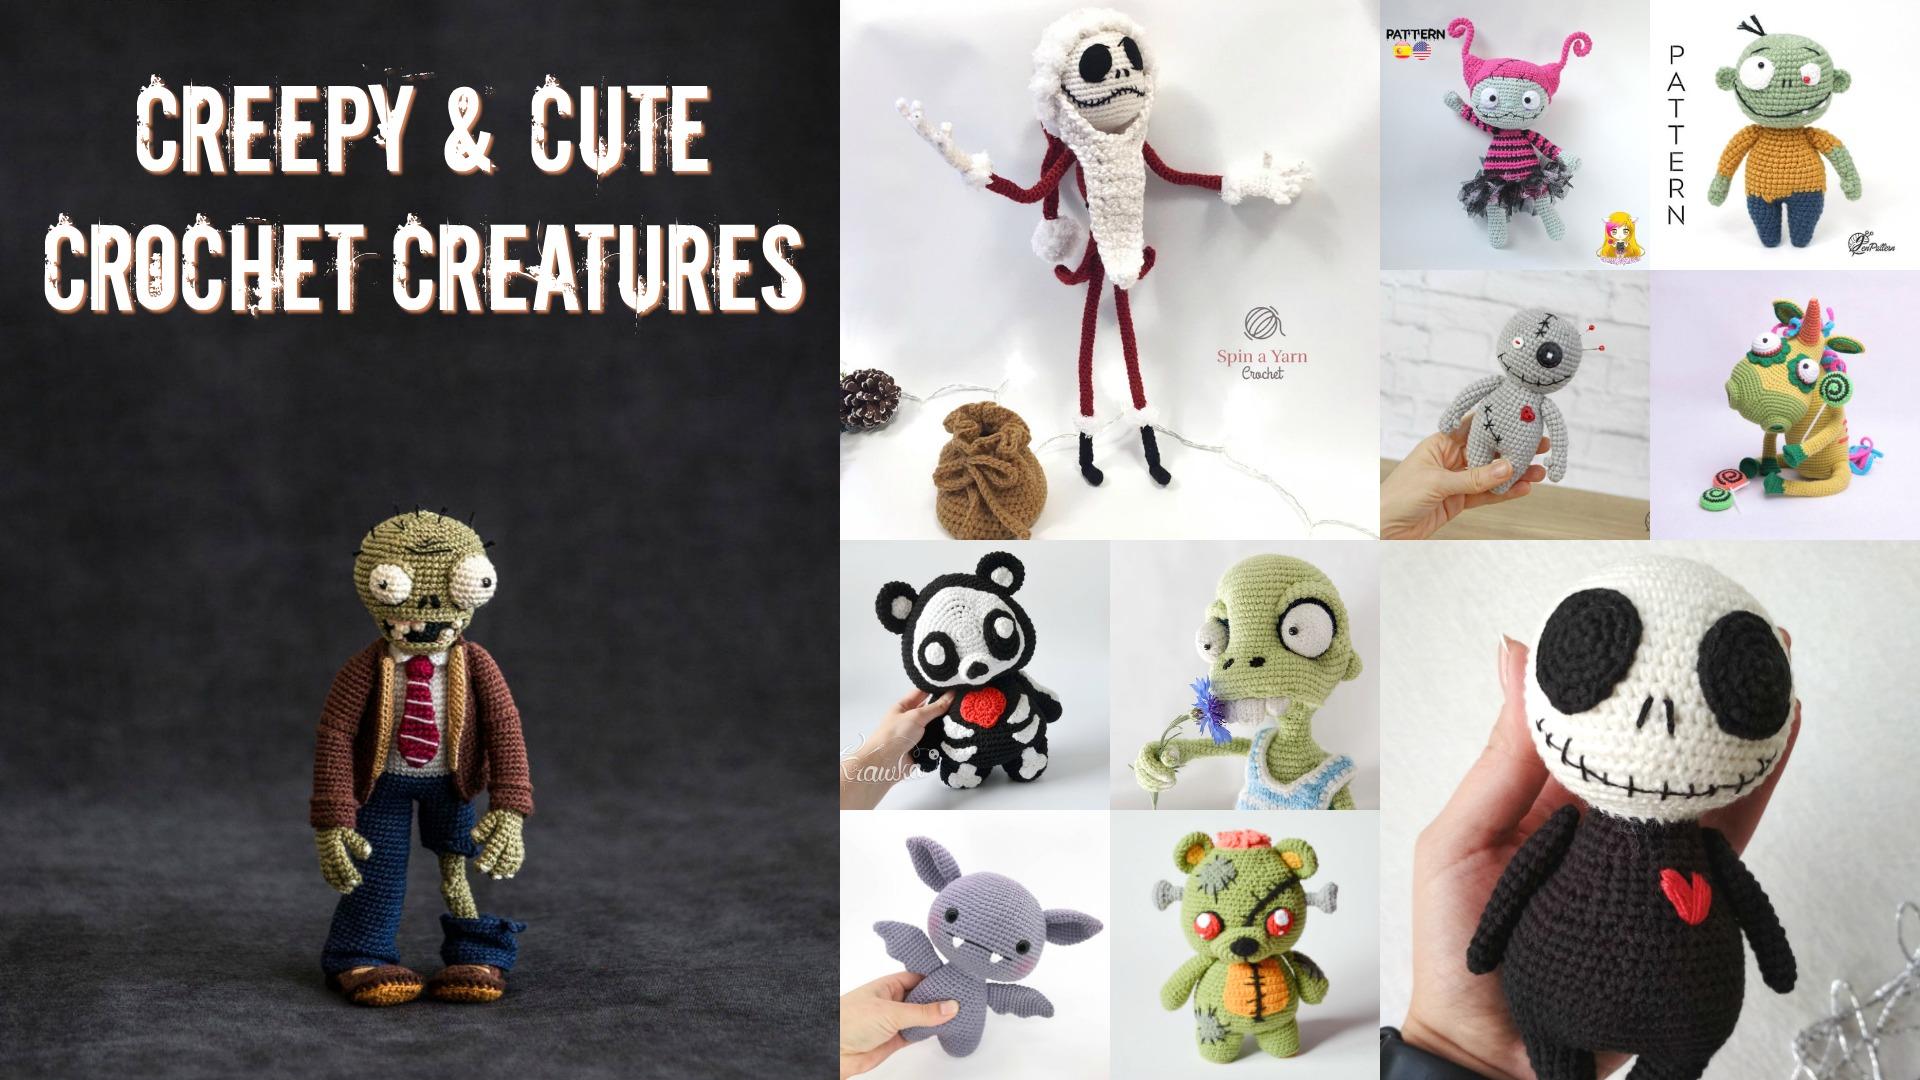 Cute Creepy Crocheted Creatures